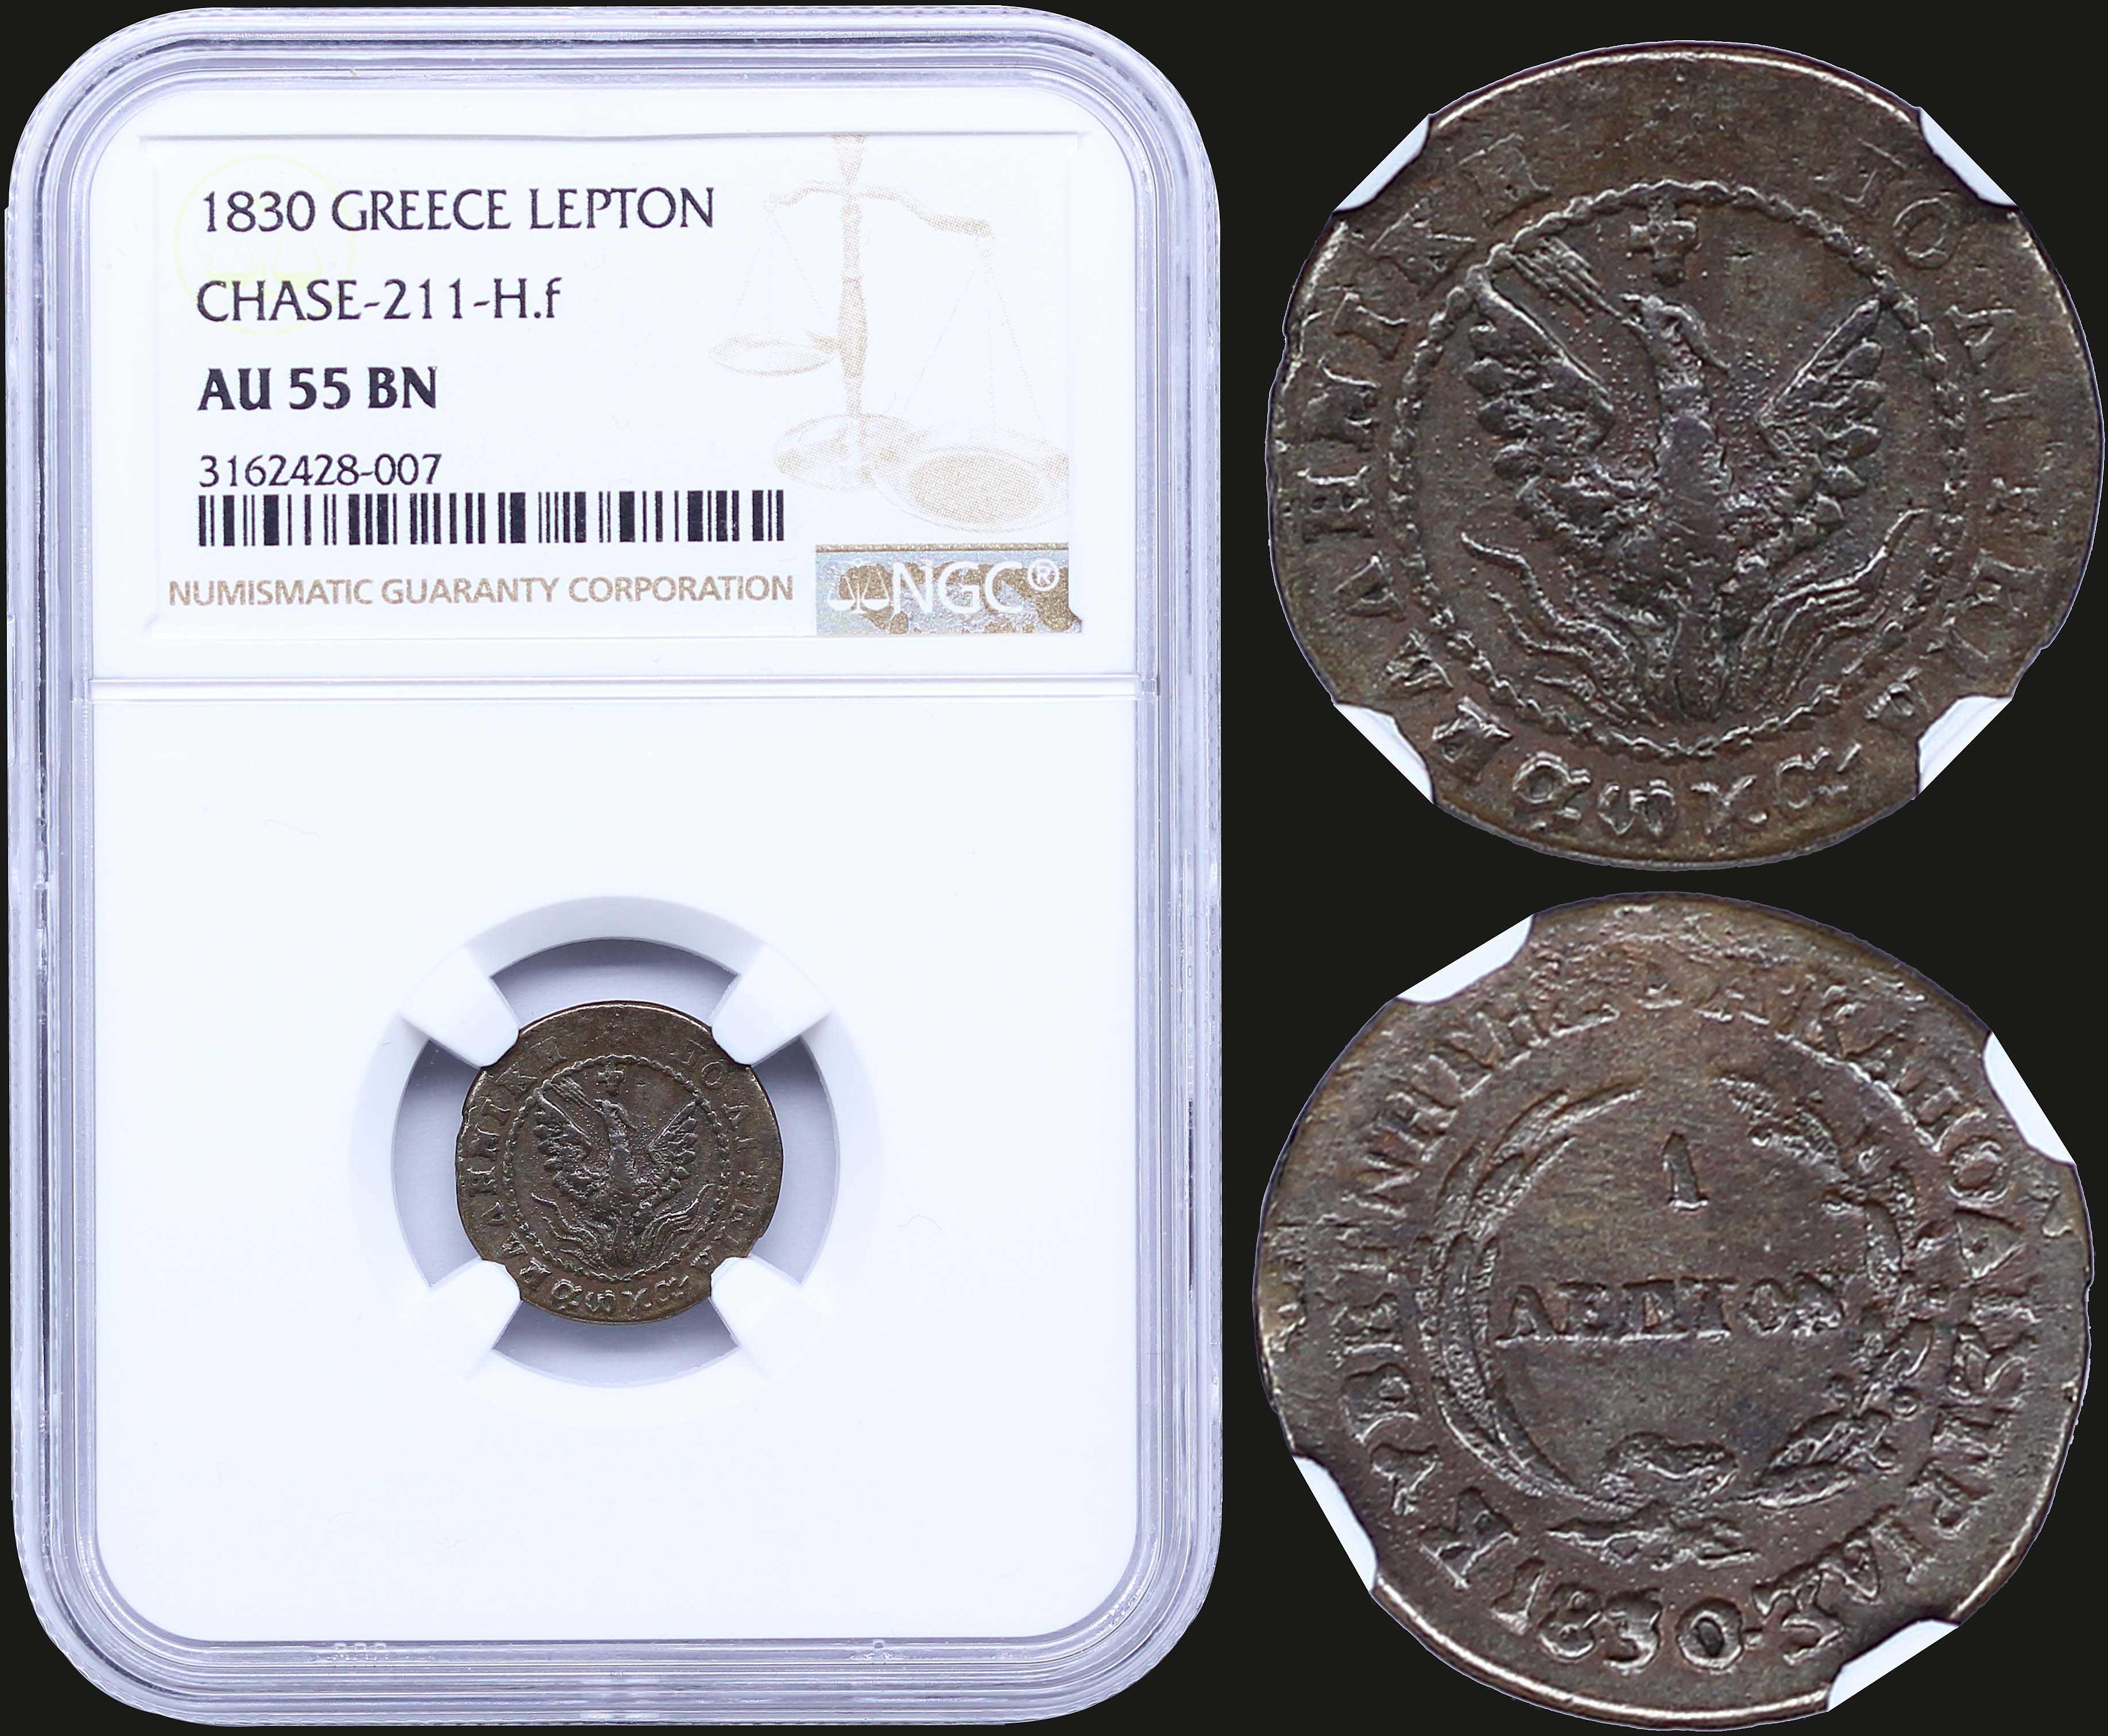 Lot 8022 - -  COINS & TOKENS governor capodistrias -  A. Karamitsos Public & Live Bid Auction 649 Coins, Medals & Banknotes